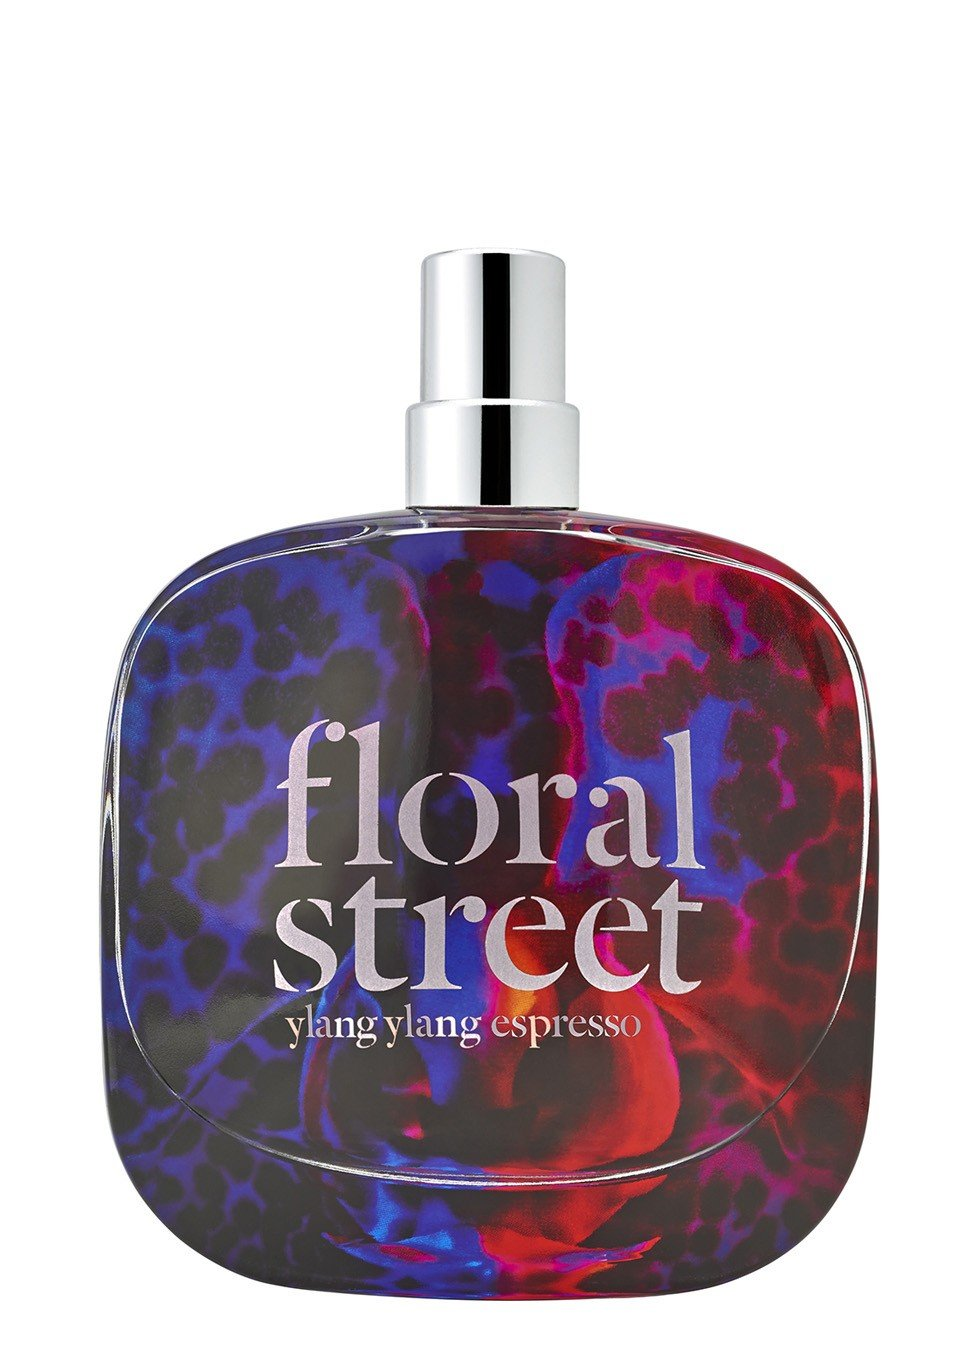 Ylang Ylang Espresso Floral Street Perfume A New